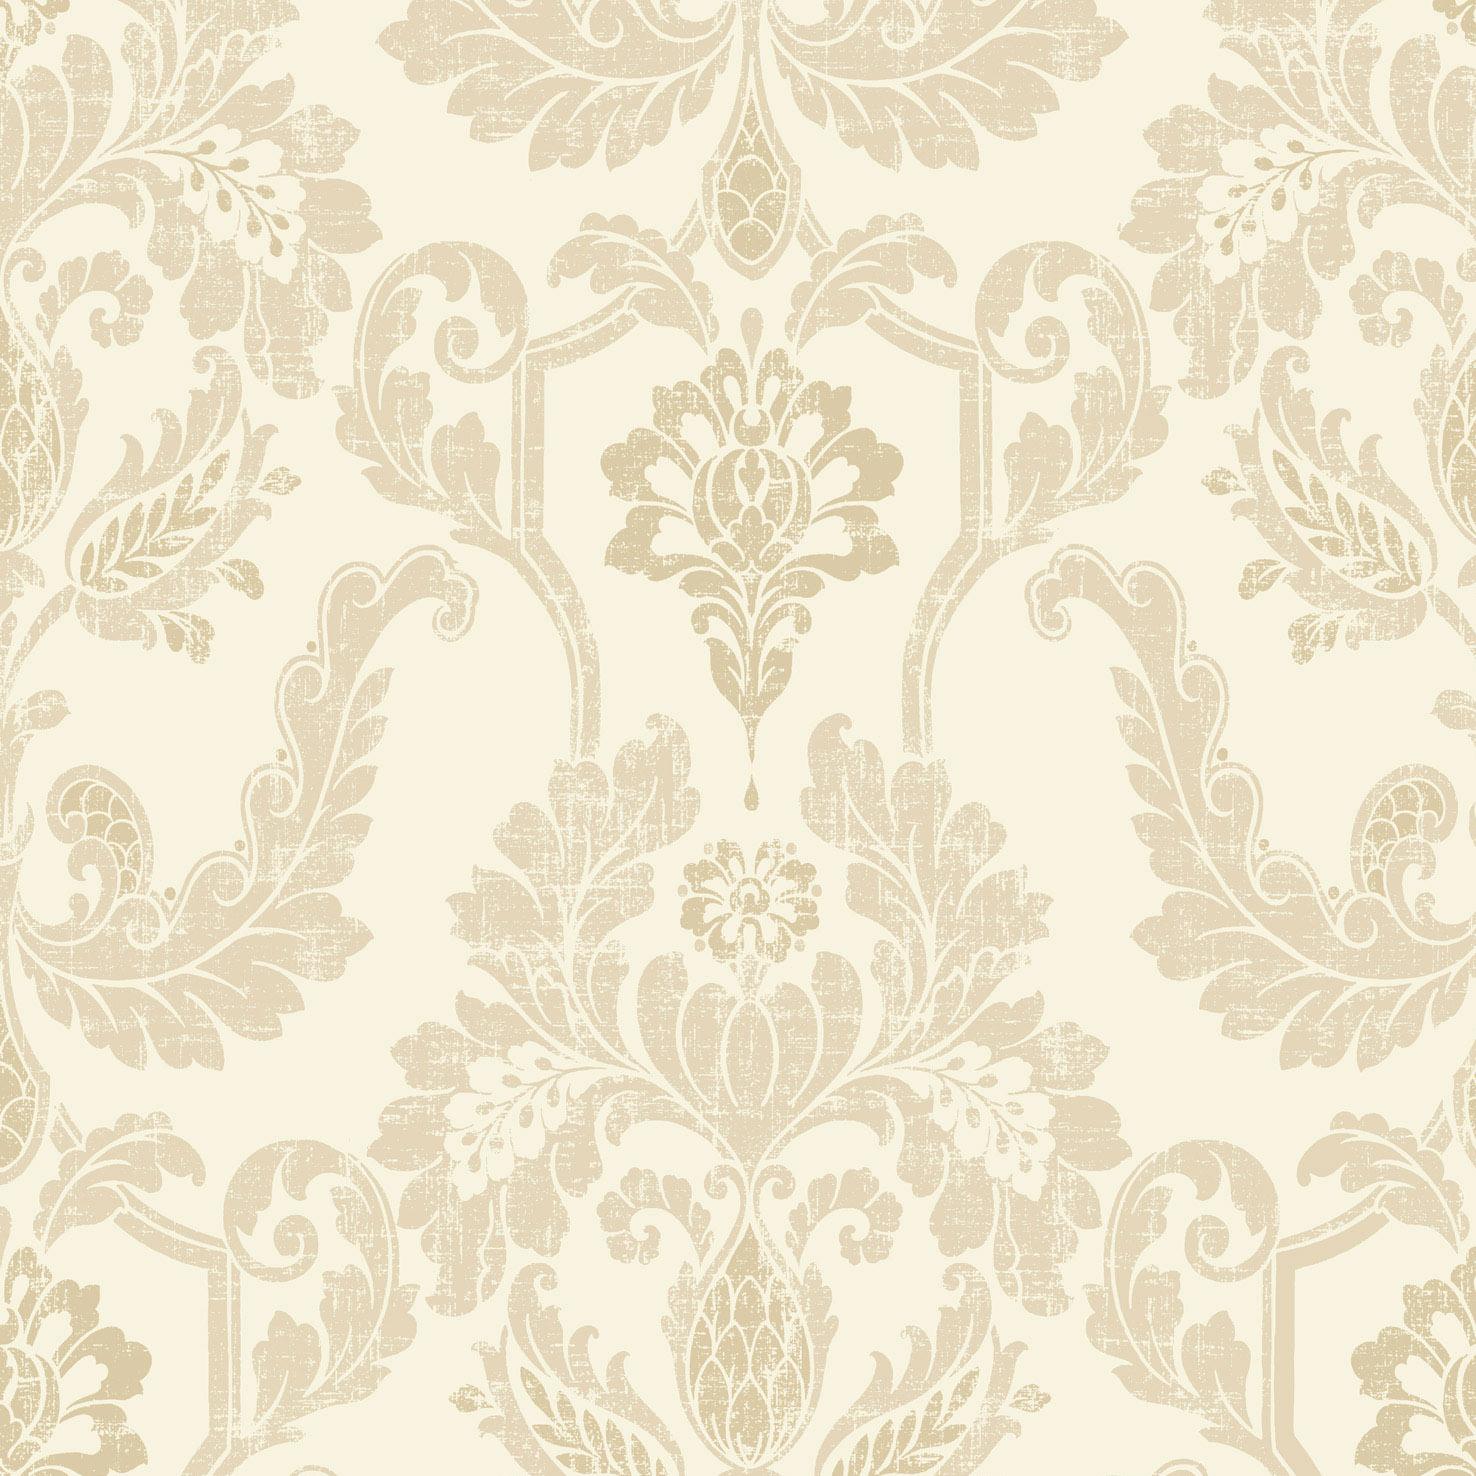 Gold and cream wallpaper wallpapersafari - Red brown and cream wallpaper ...